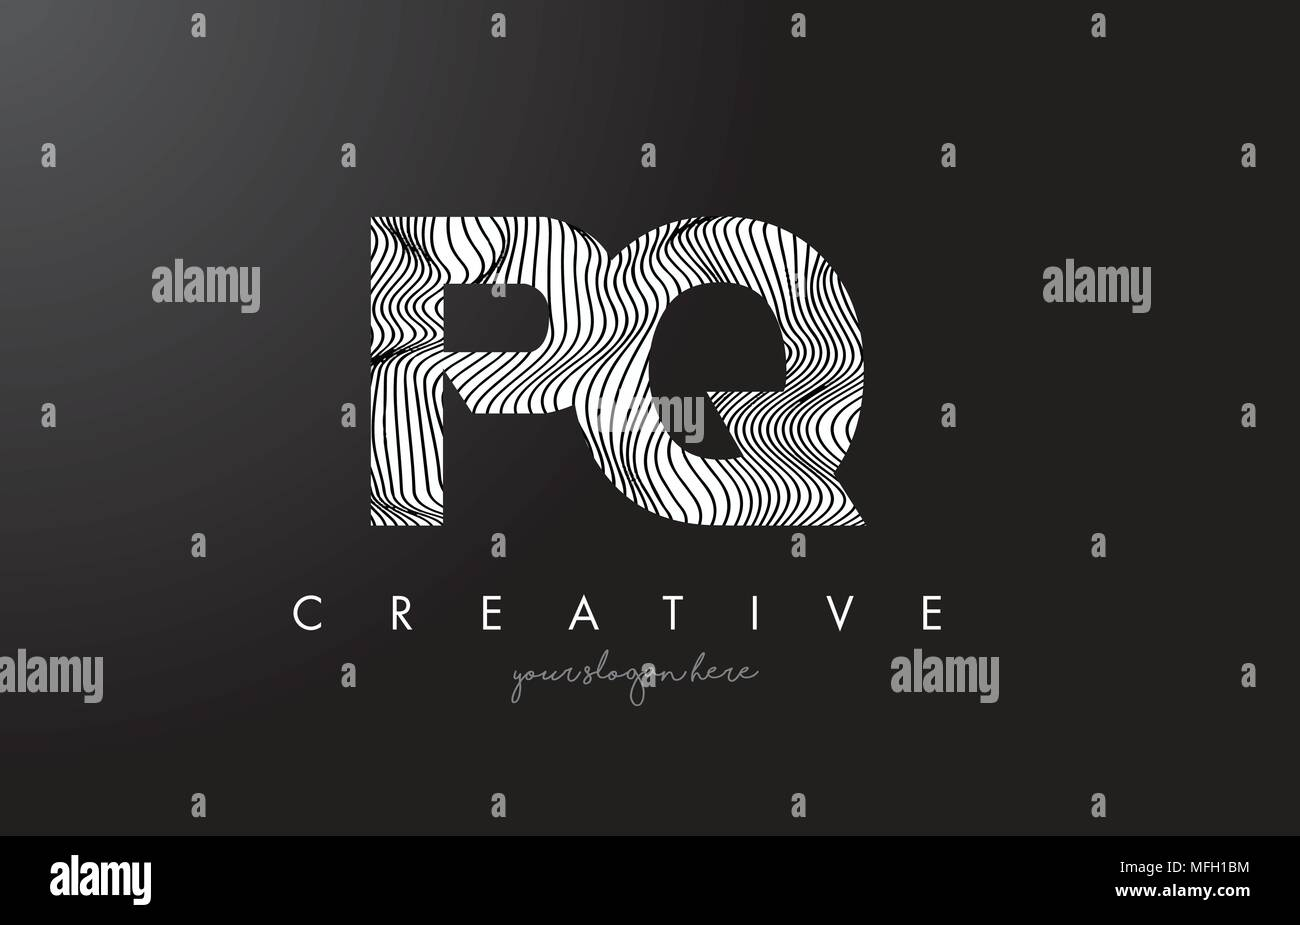 PQ P Q Letter Logo with Zebra Lines Texture Design Vector Illustration. - Stock Image